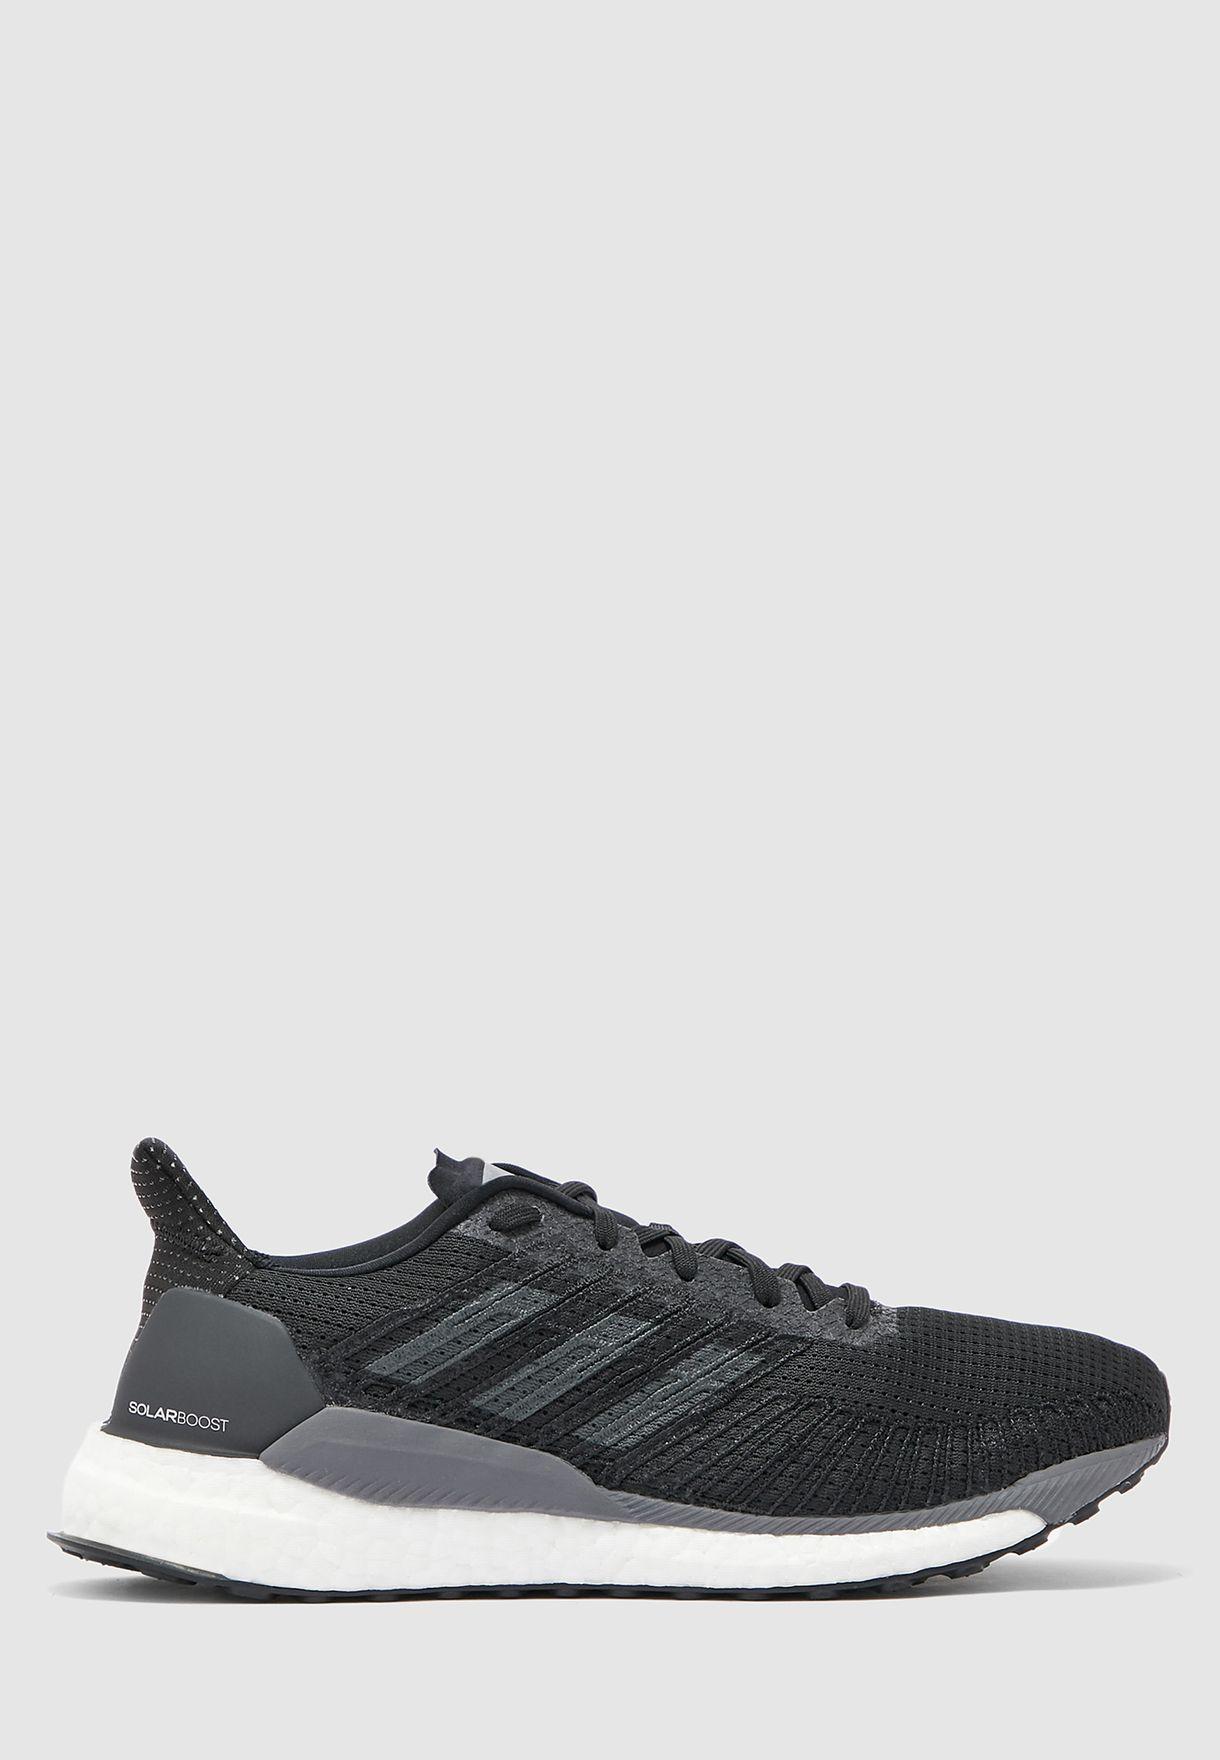 billig adidas Solar BOOST Running Shoes (For Men) liefert